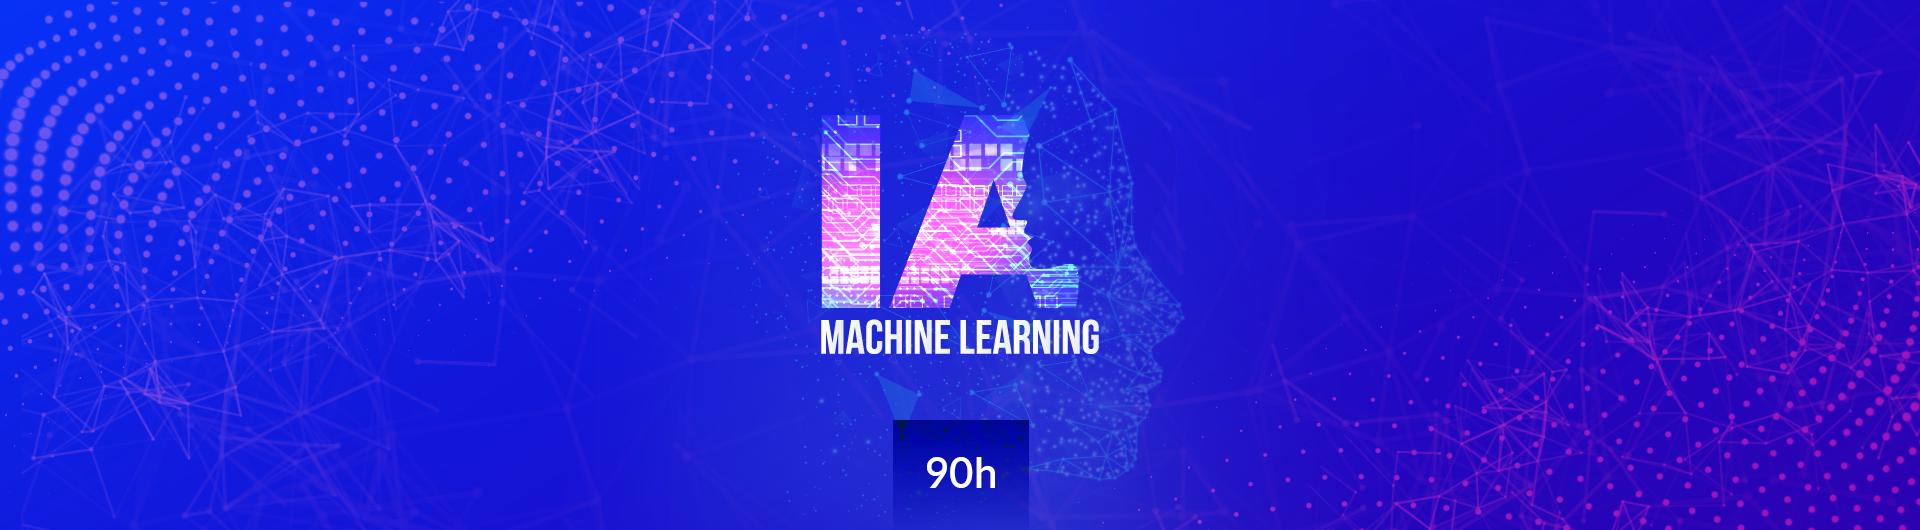 Inteligência Artificial (IA) & Machine LearningCopiar